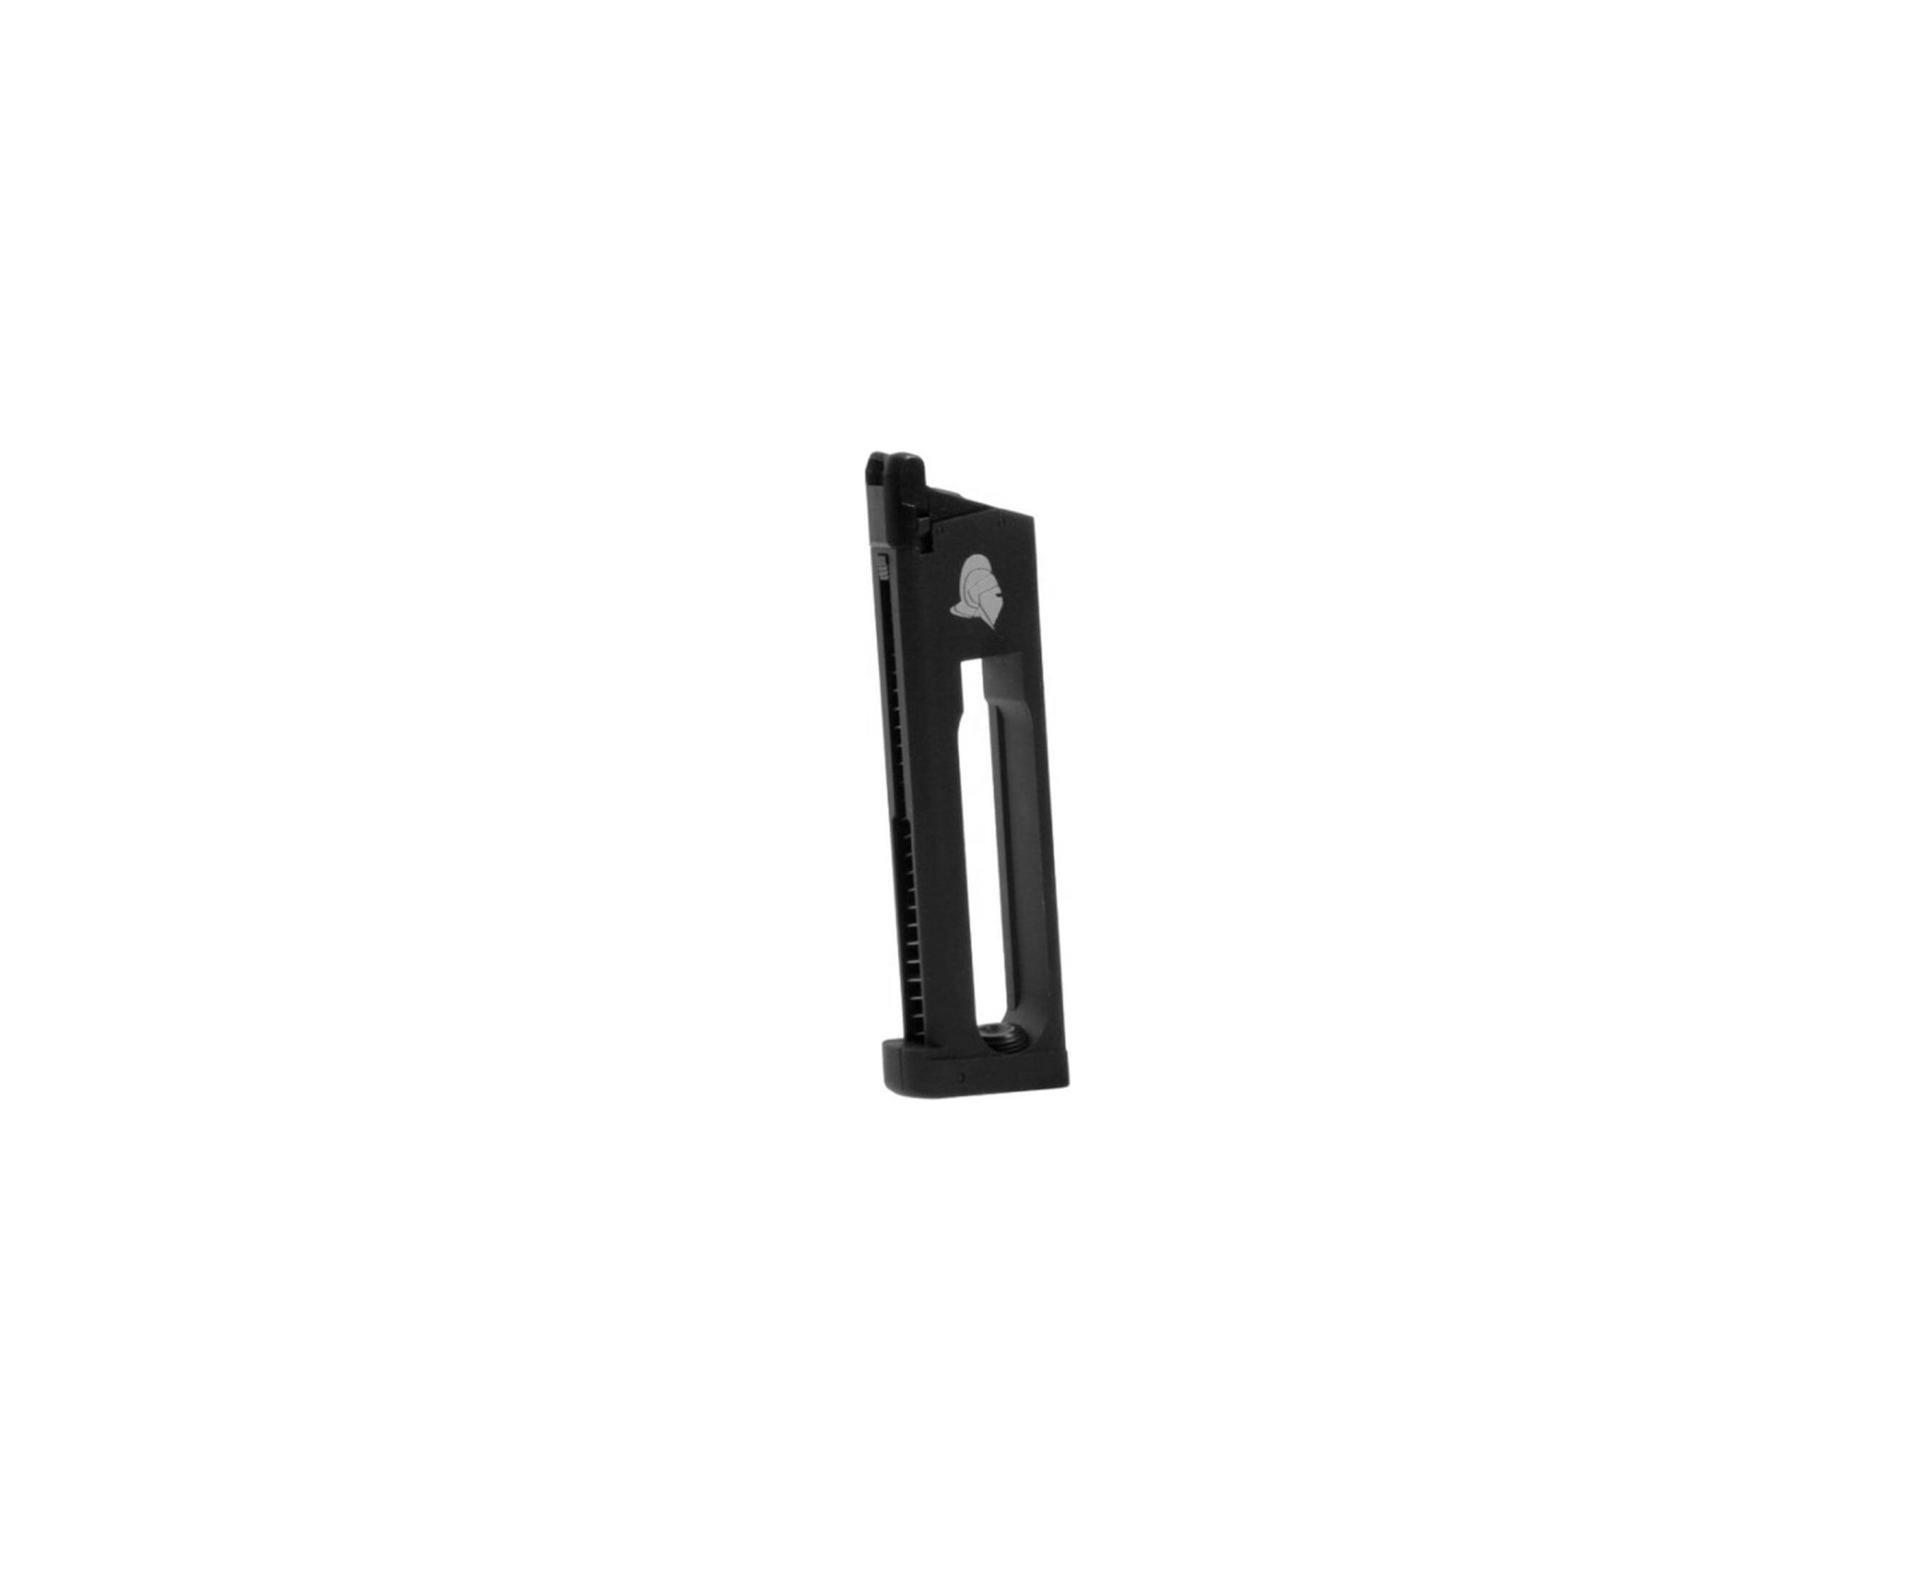 Magazine Co2 Pistolas Secutor  Serie Rudis Full Metal 6mm